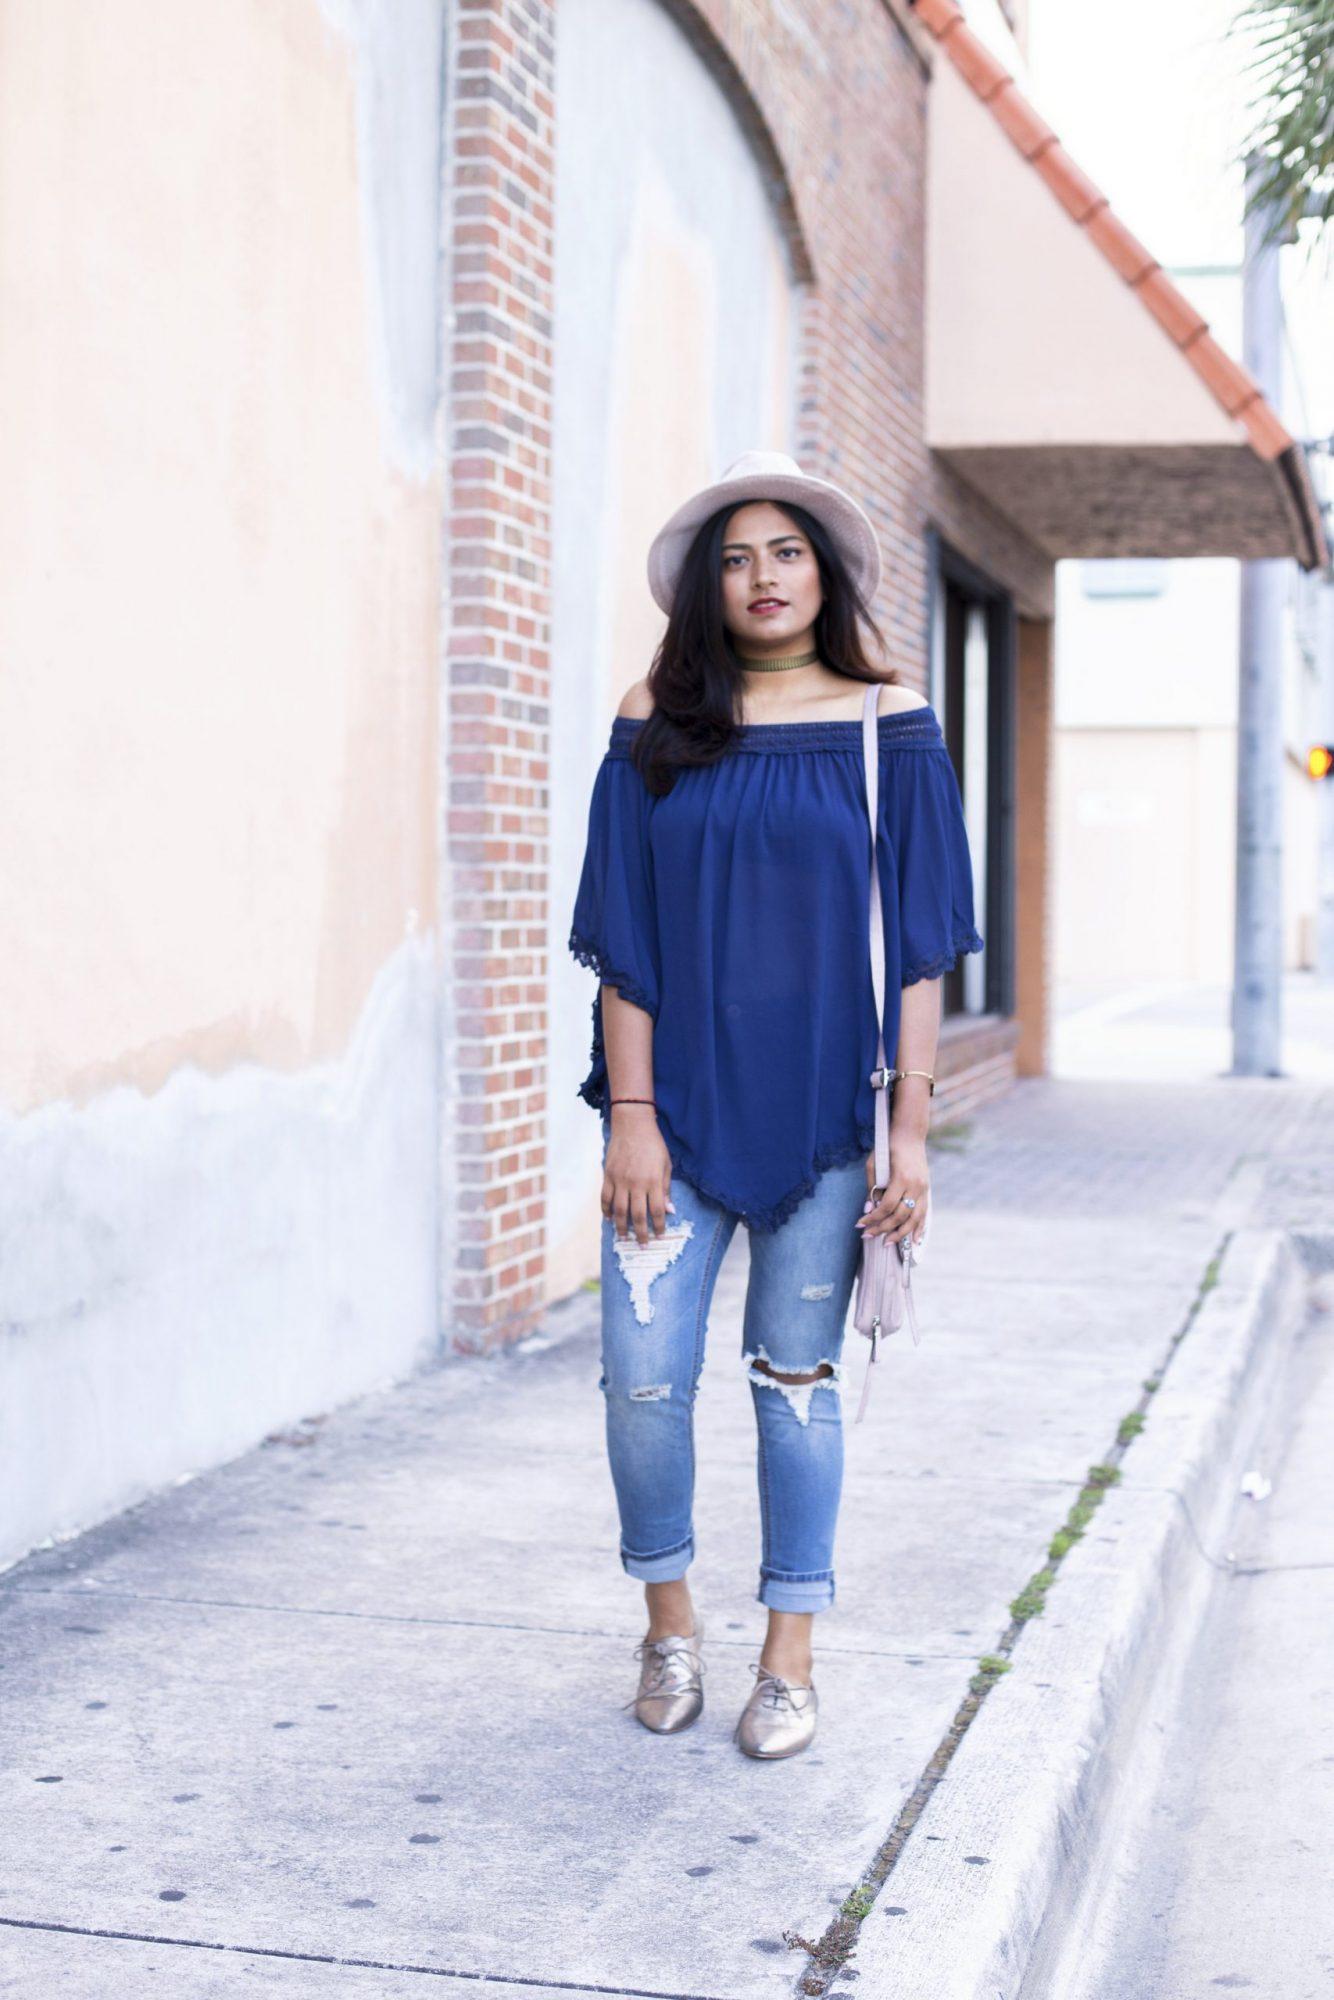 Summer Blue Street Style